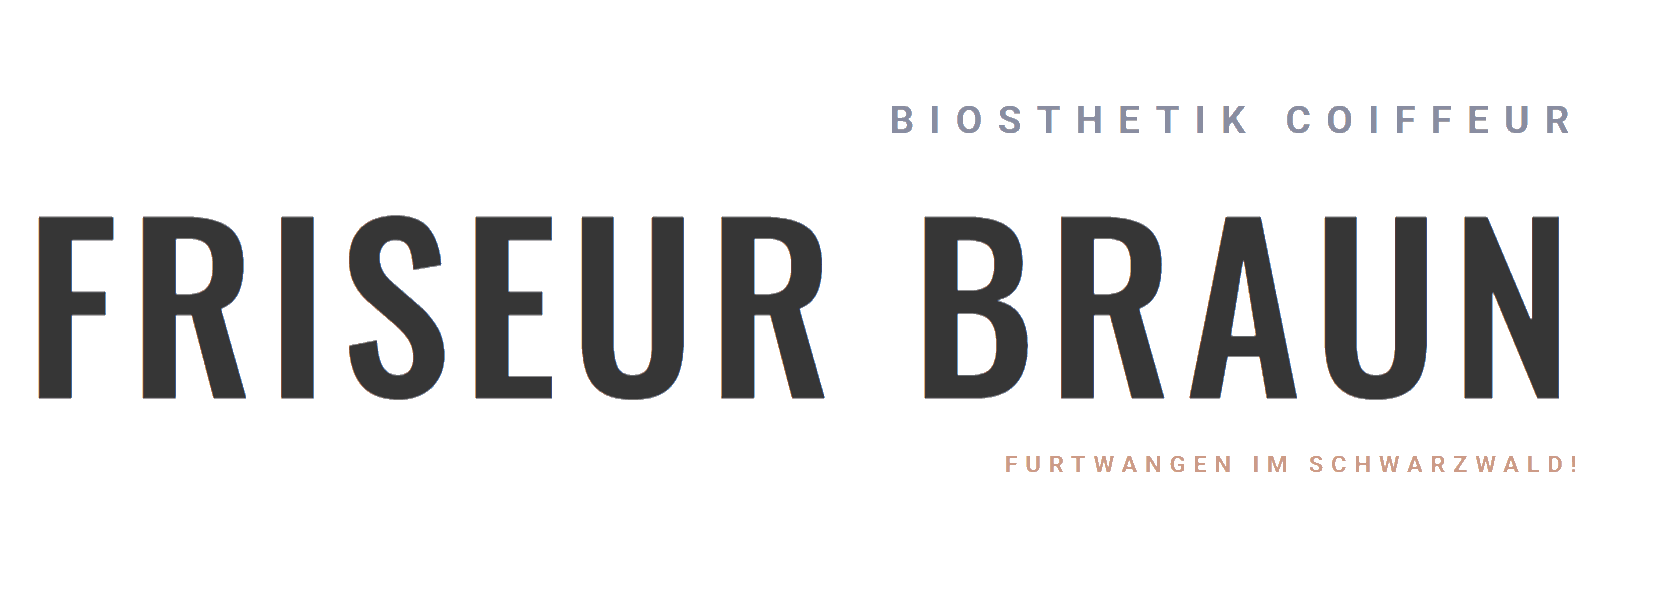 Friseur Braun Furtwangen im Schwarzwald